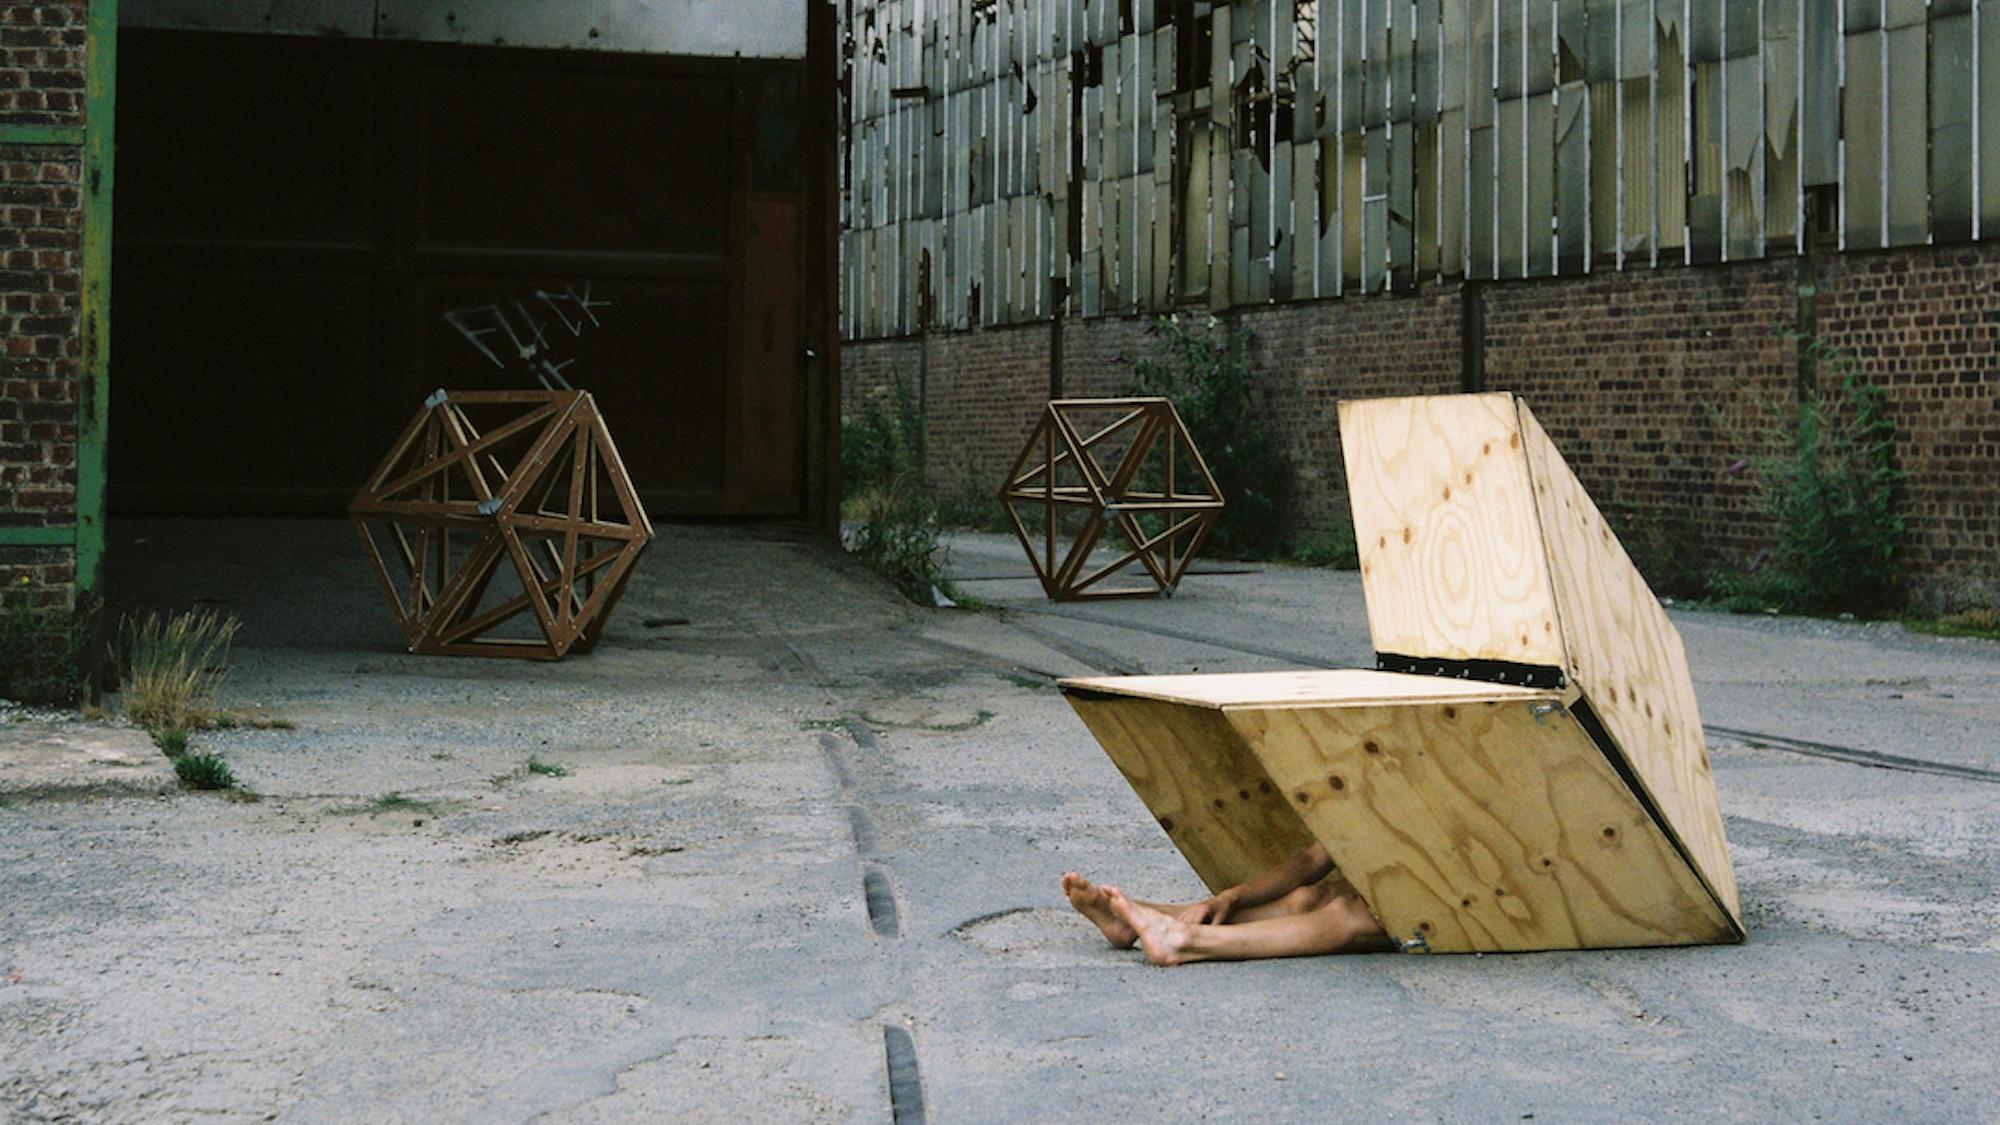 OriVolution © Adrien Lecouturier